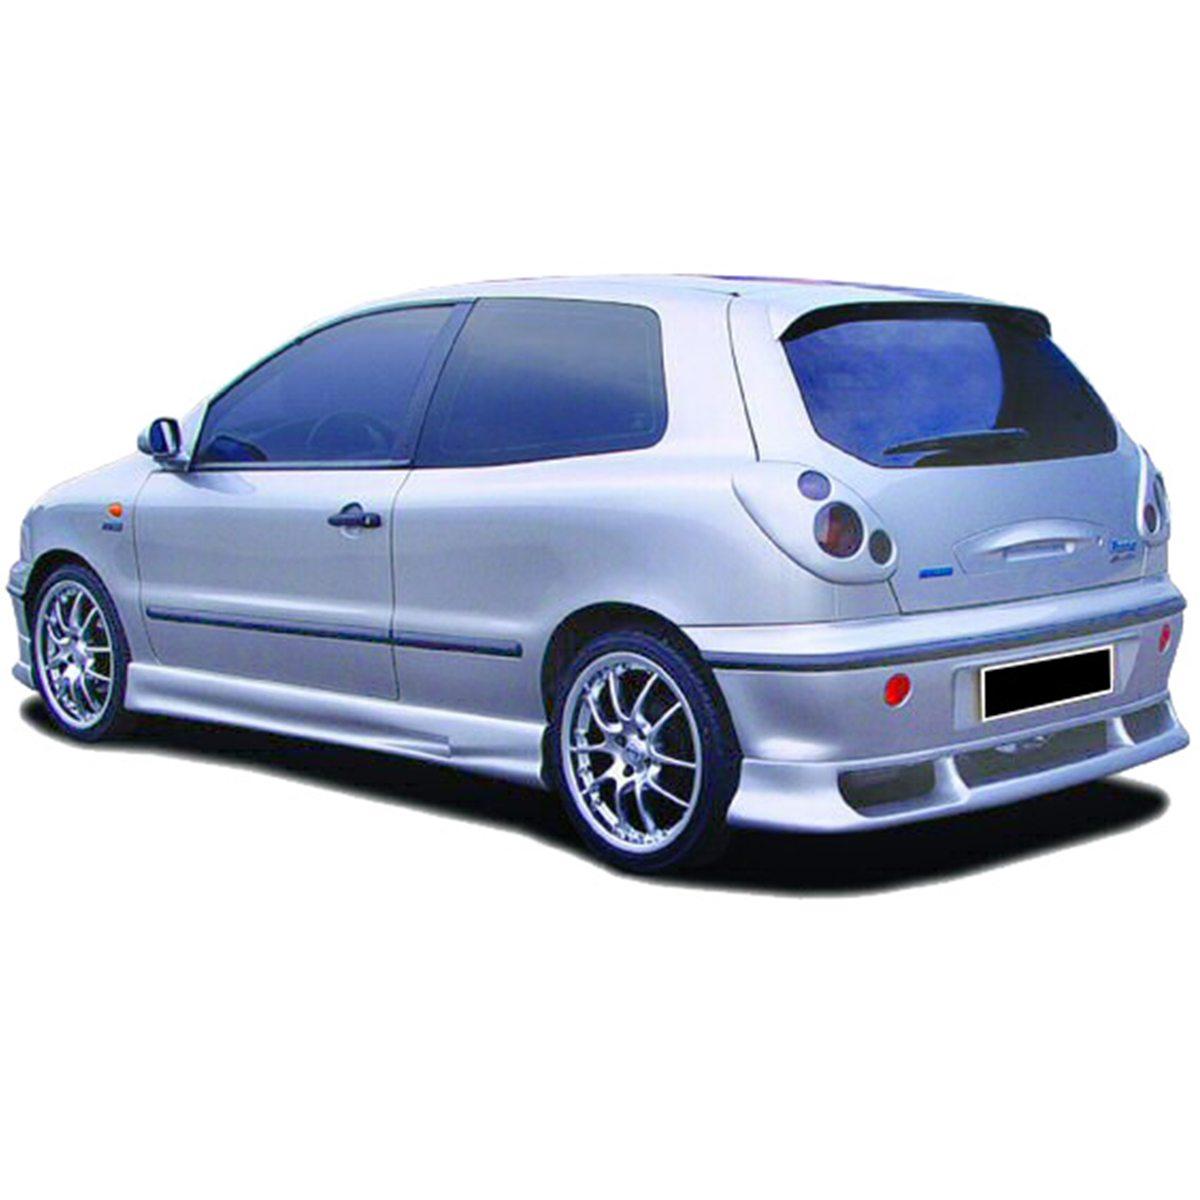 Fiat-Bravo-Speed-Tras-SPA012-1